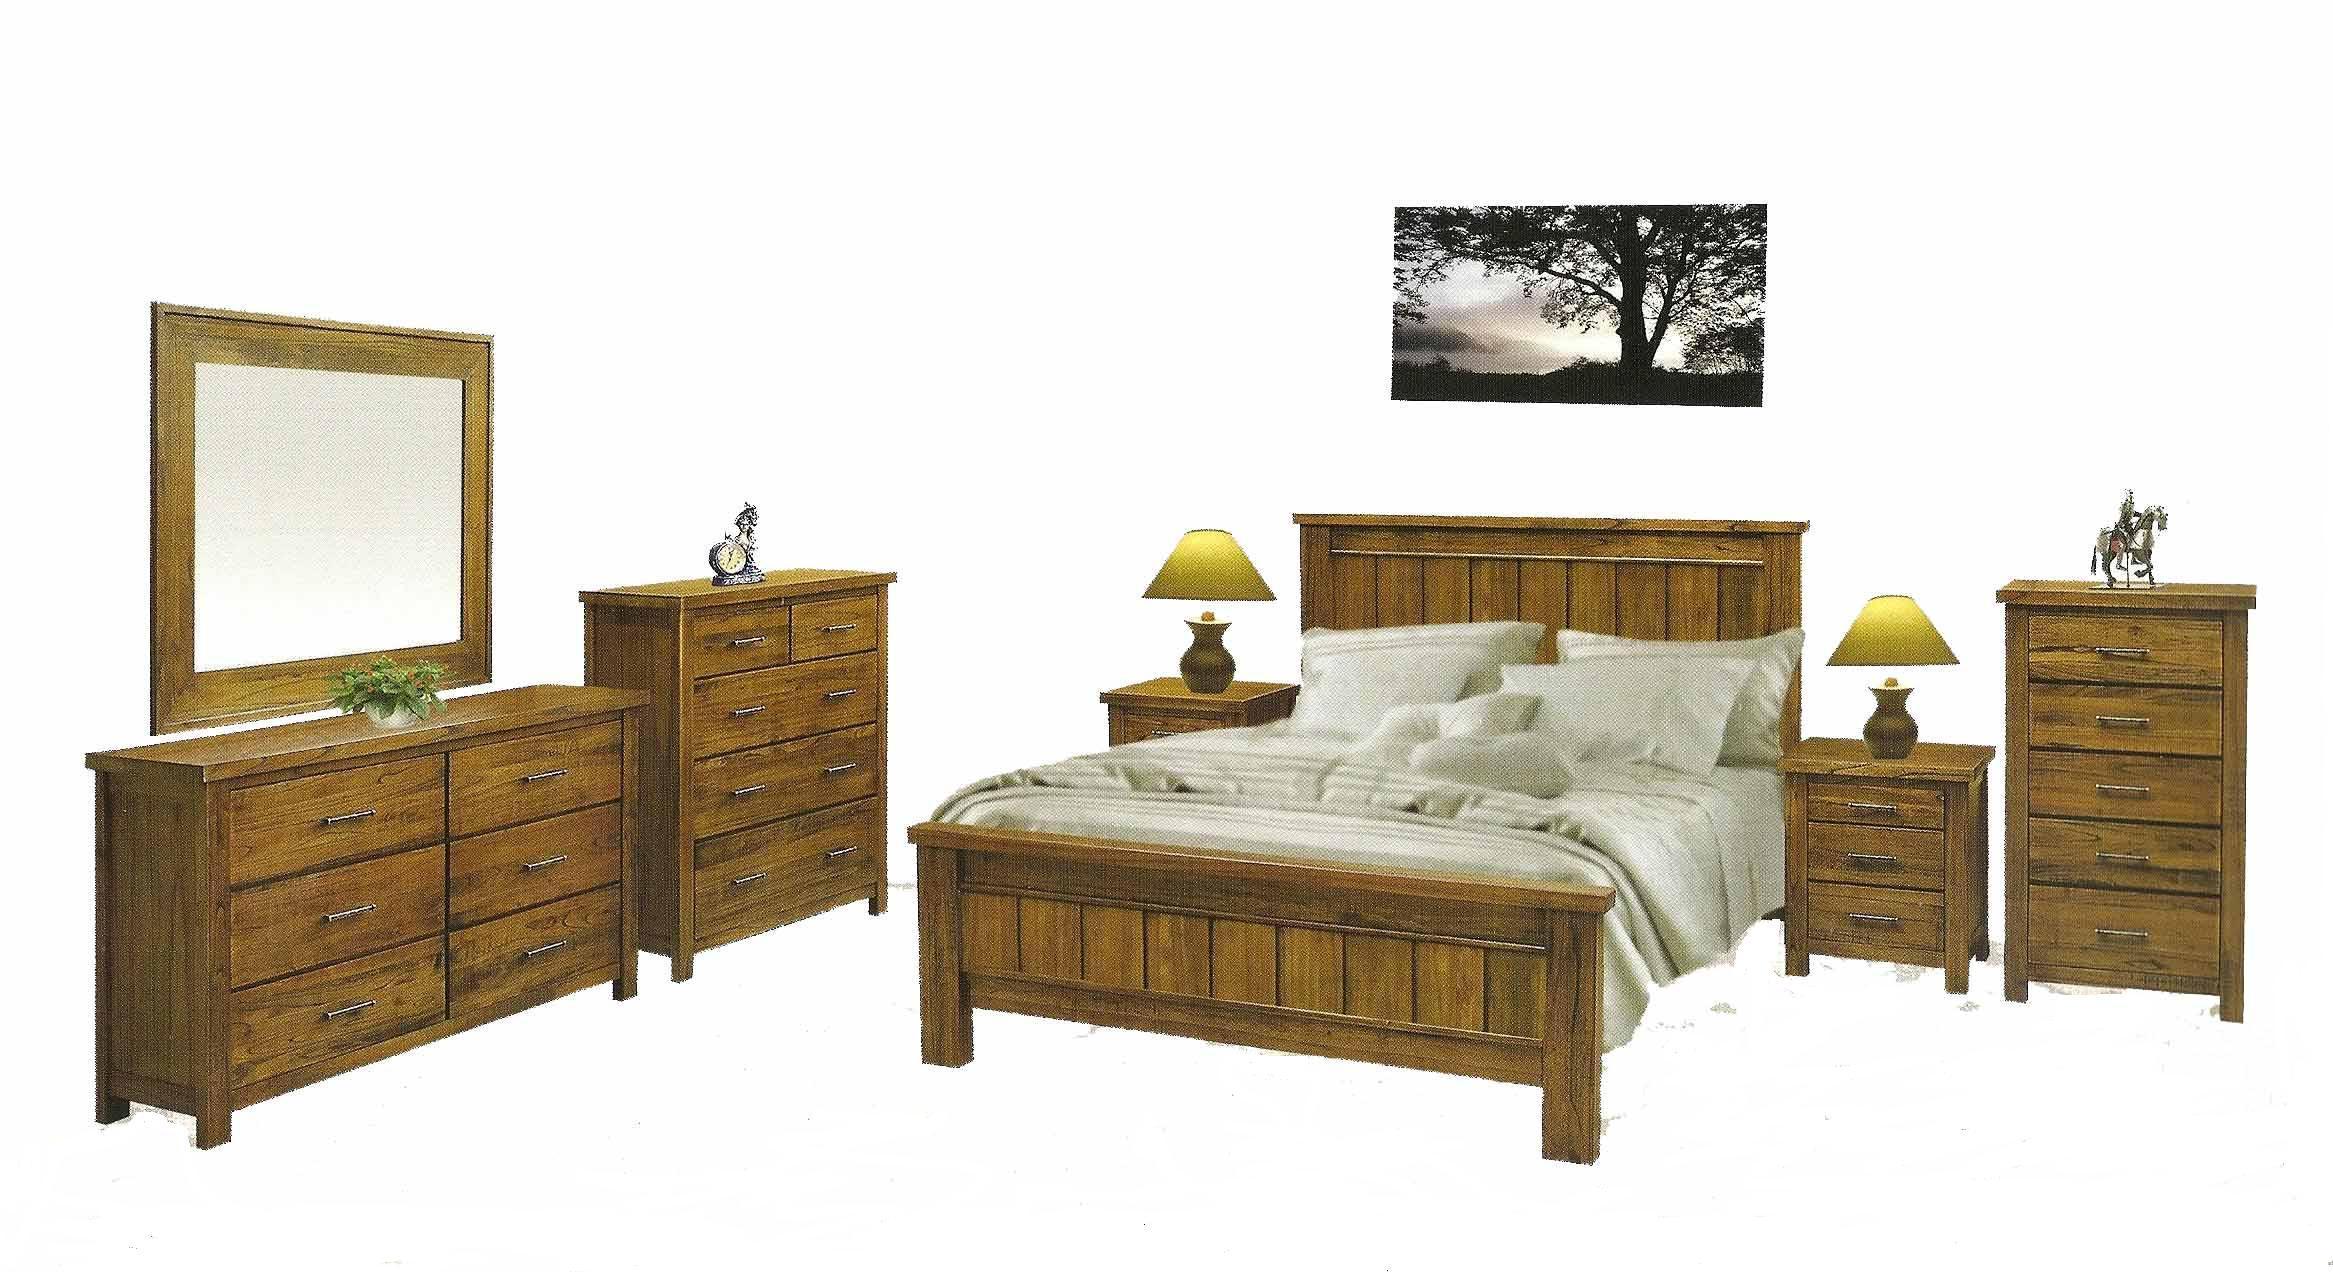 Milan Bedroom Furniture New Age Milan Bedroom Suite 7 Pce Larkos Furniture Store